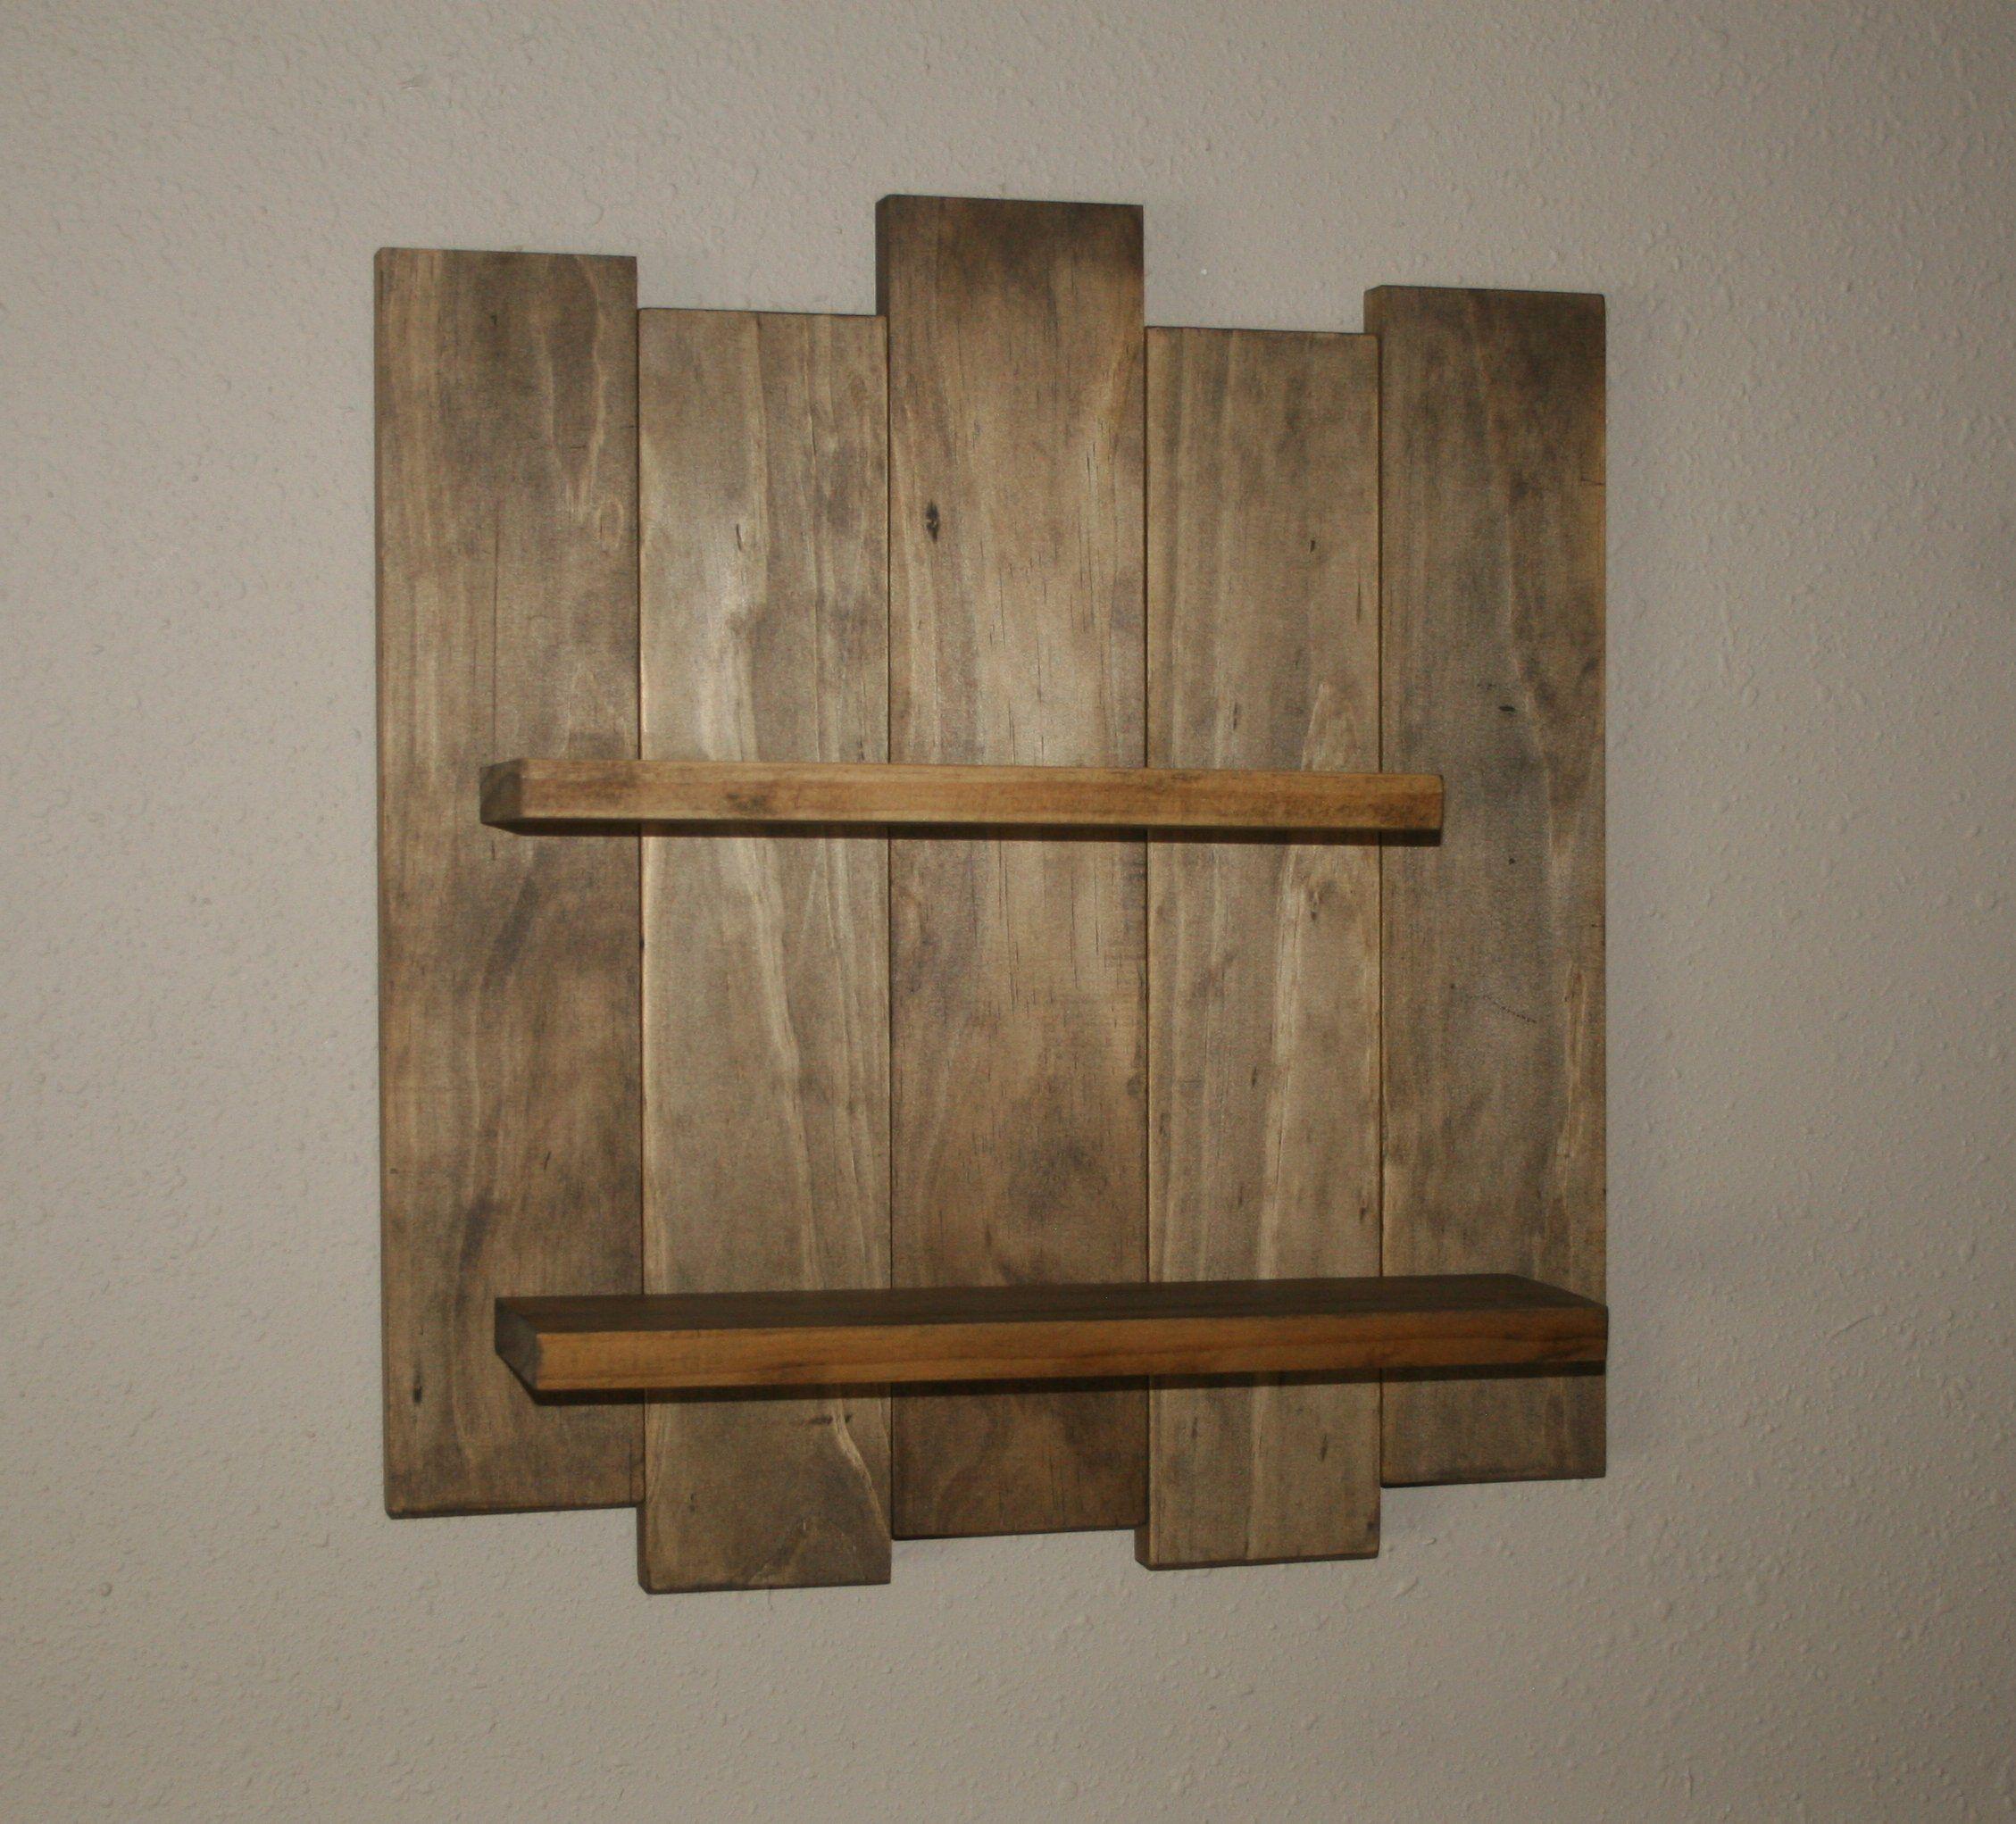 Rustic Wood Wall Shelf Reclaimed Wood Shelf Distressed Pallet Wood Primitive Home Decor Western Oa Rustic Wood Walls Reclaimed Wood Shelves Wood Pallets